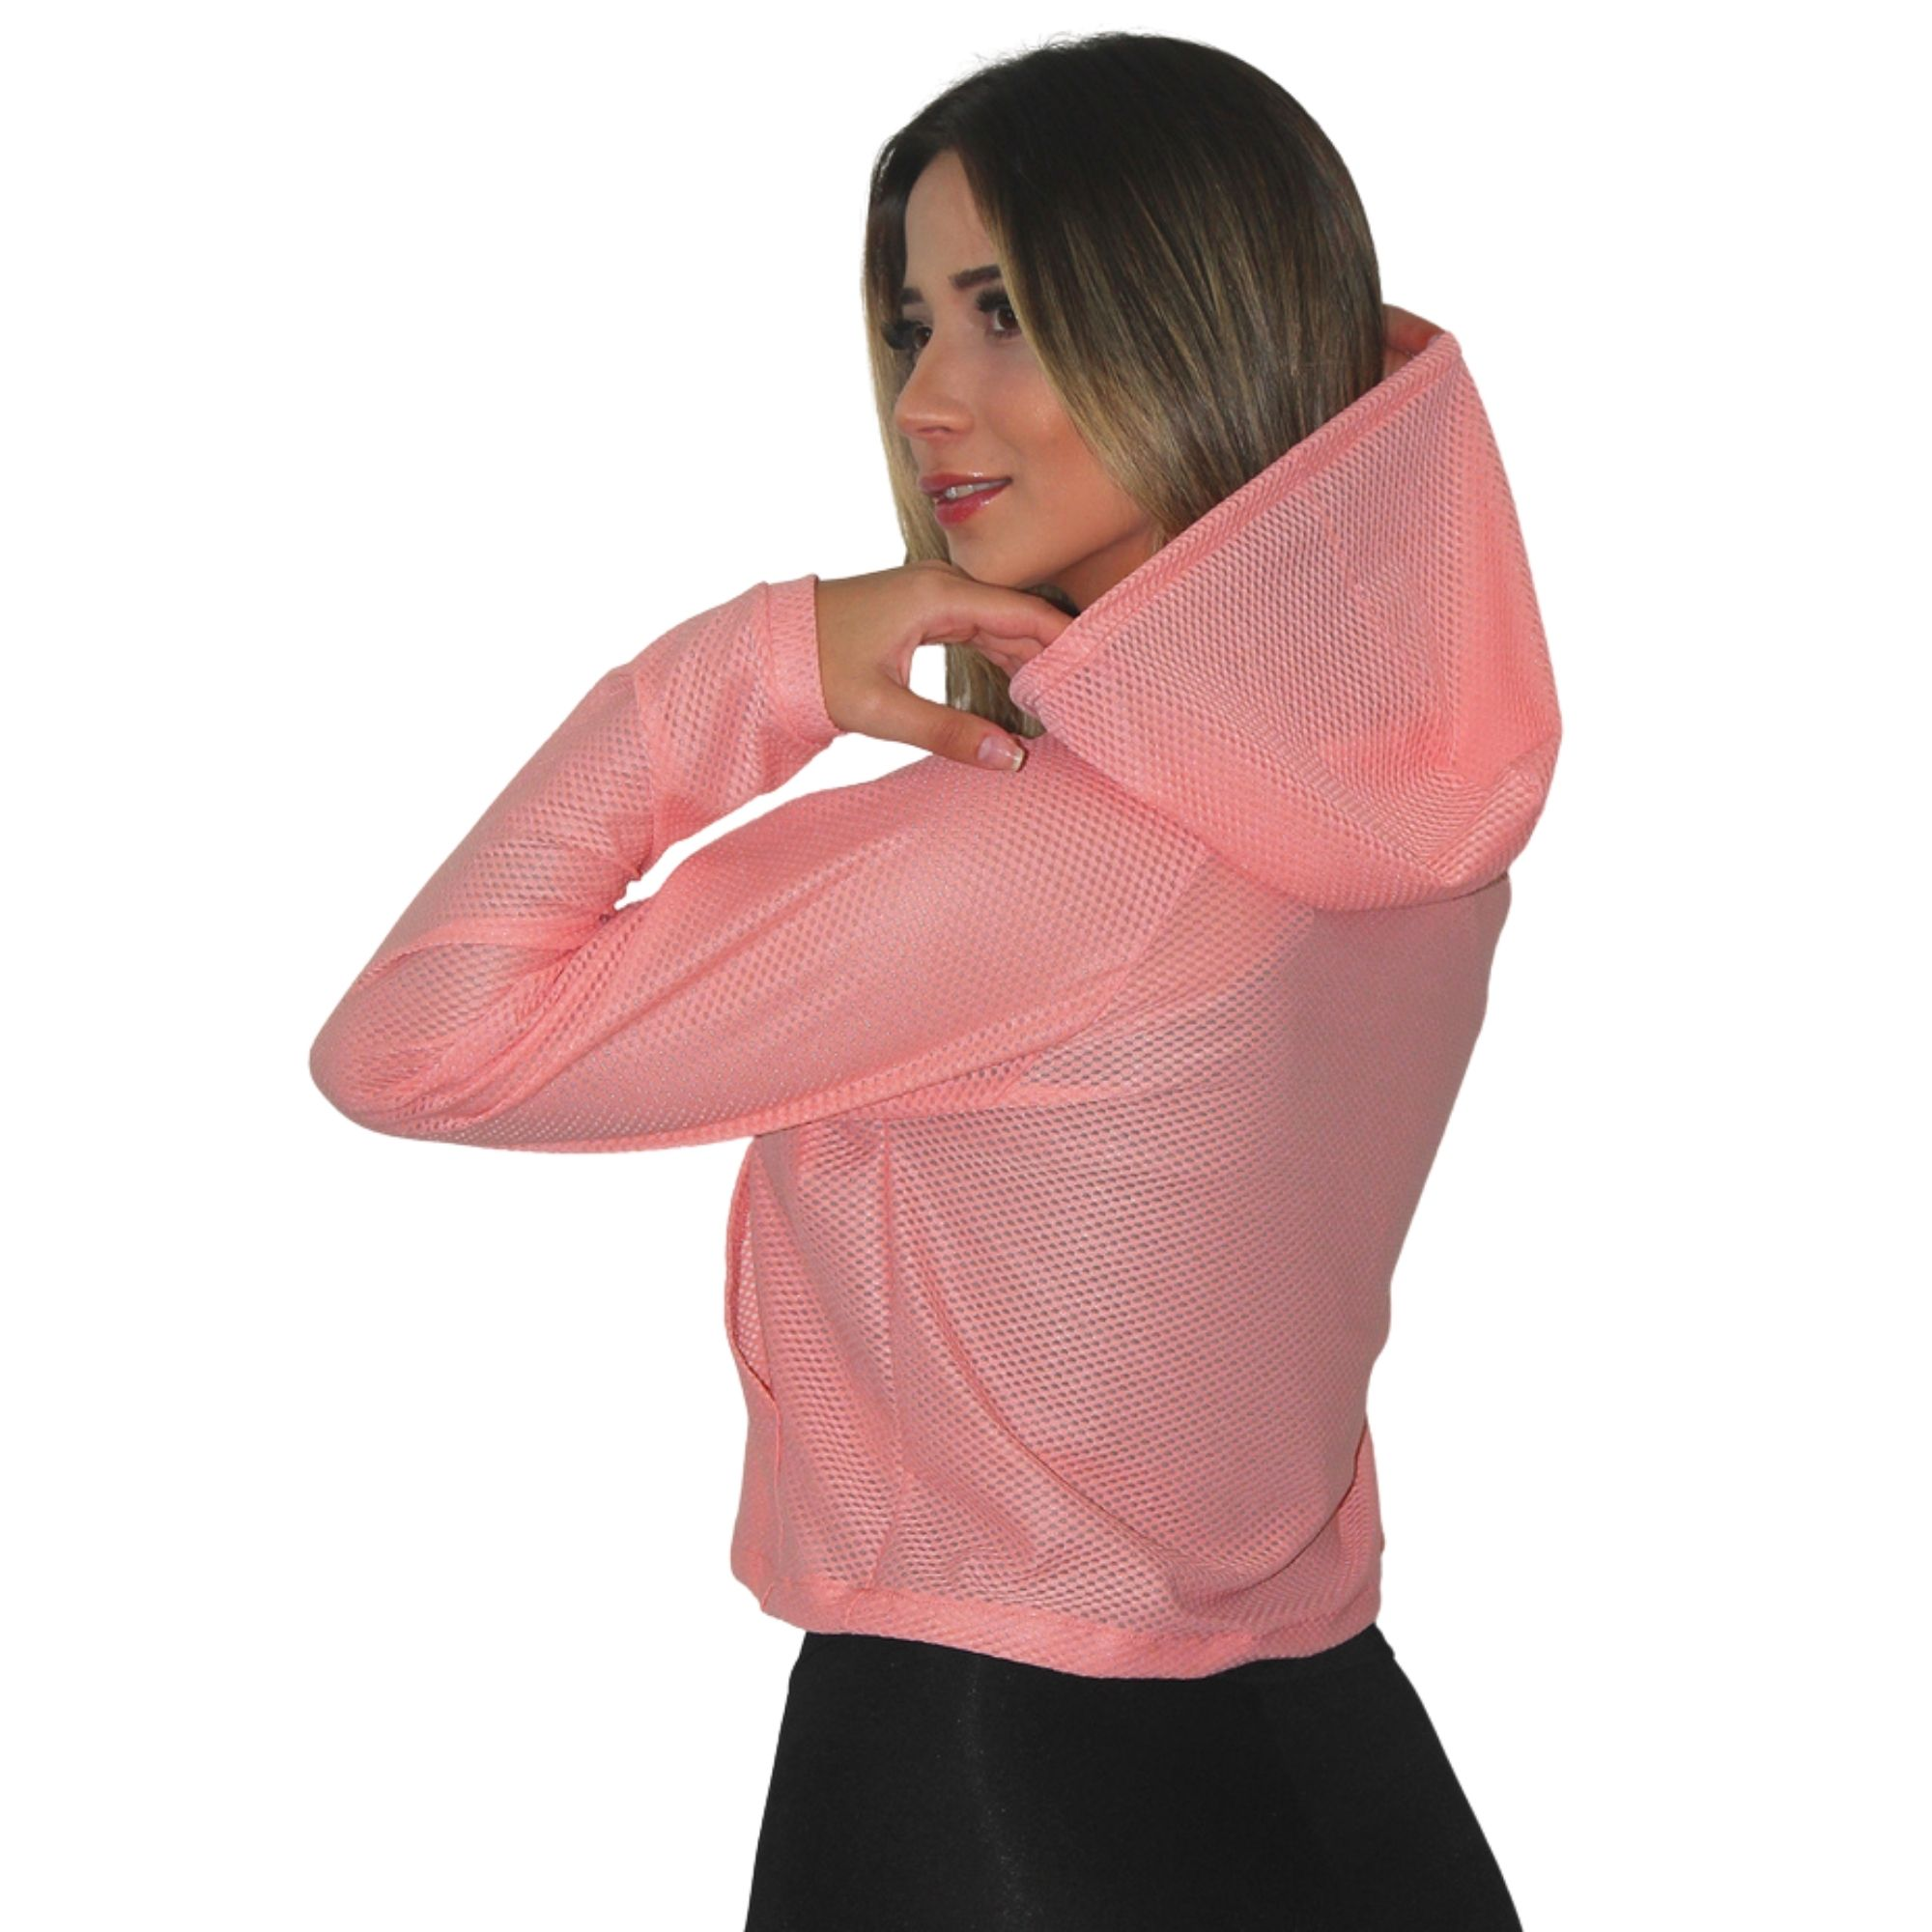 Jaqueta de Bolso Feminina Dry Fit